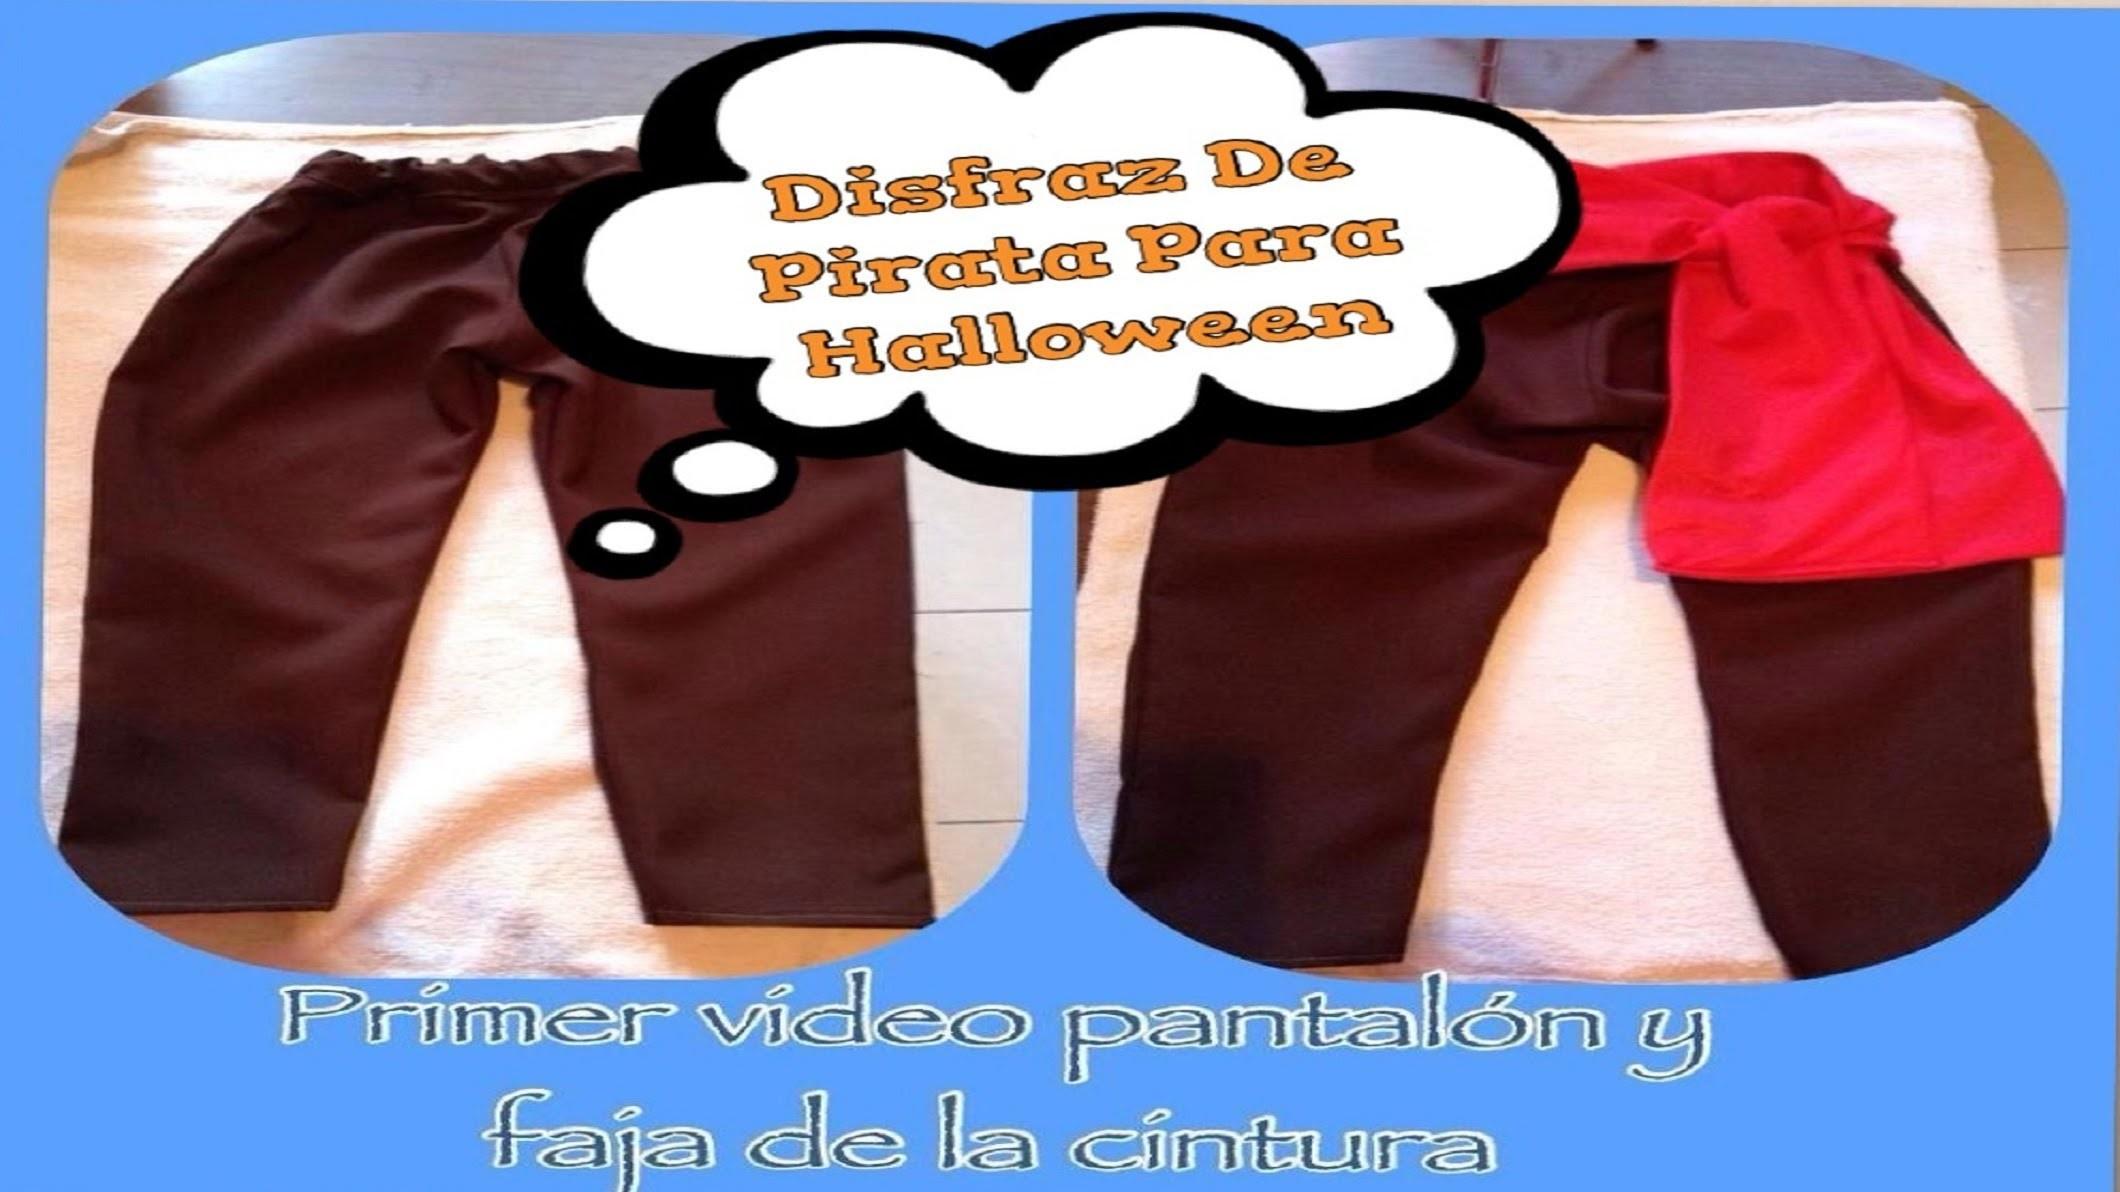 Elaborando Disfraz De Halloween (( Disfraz De Pirata )) - Pantalon y Faja De La Cintura -